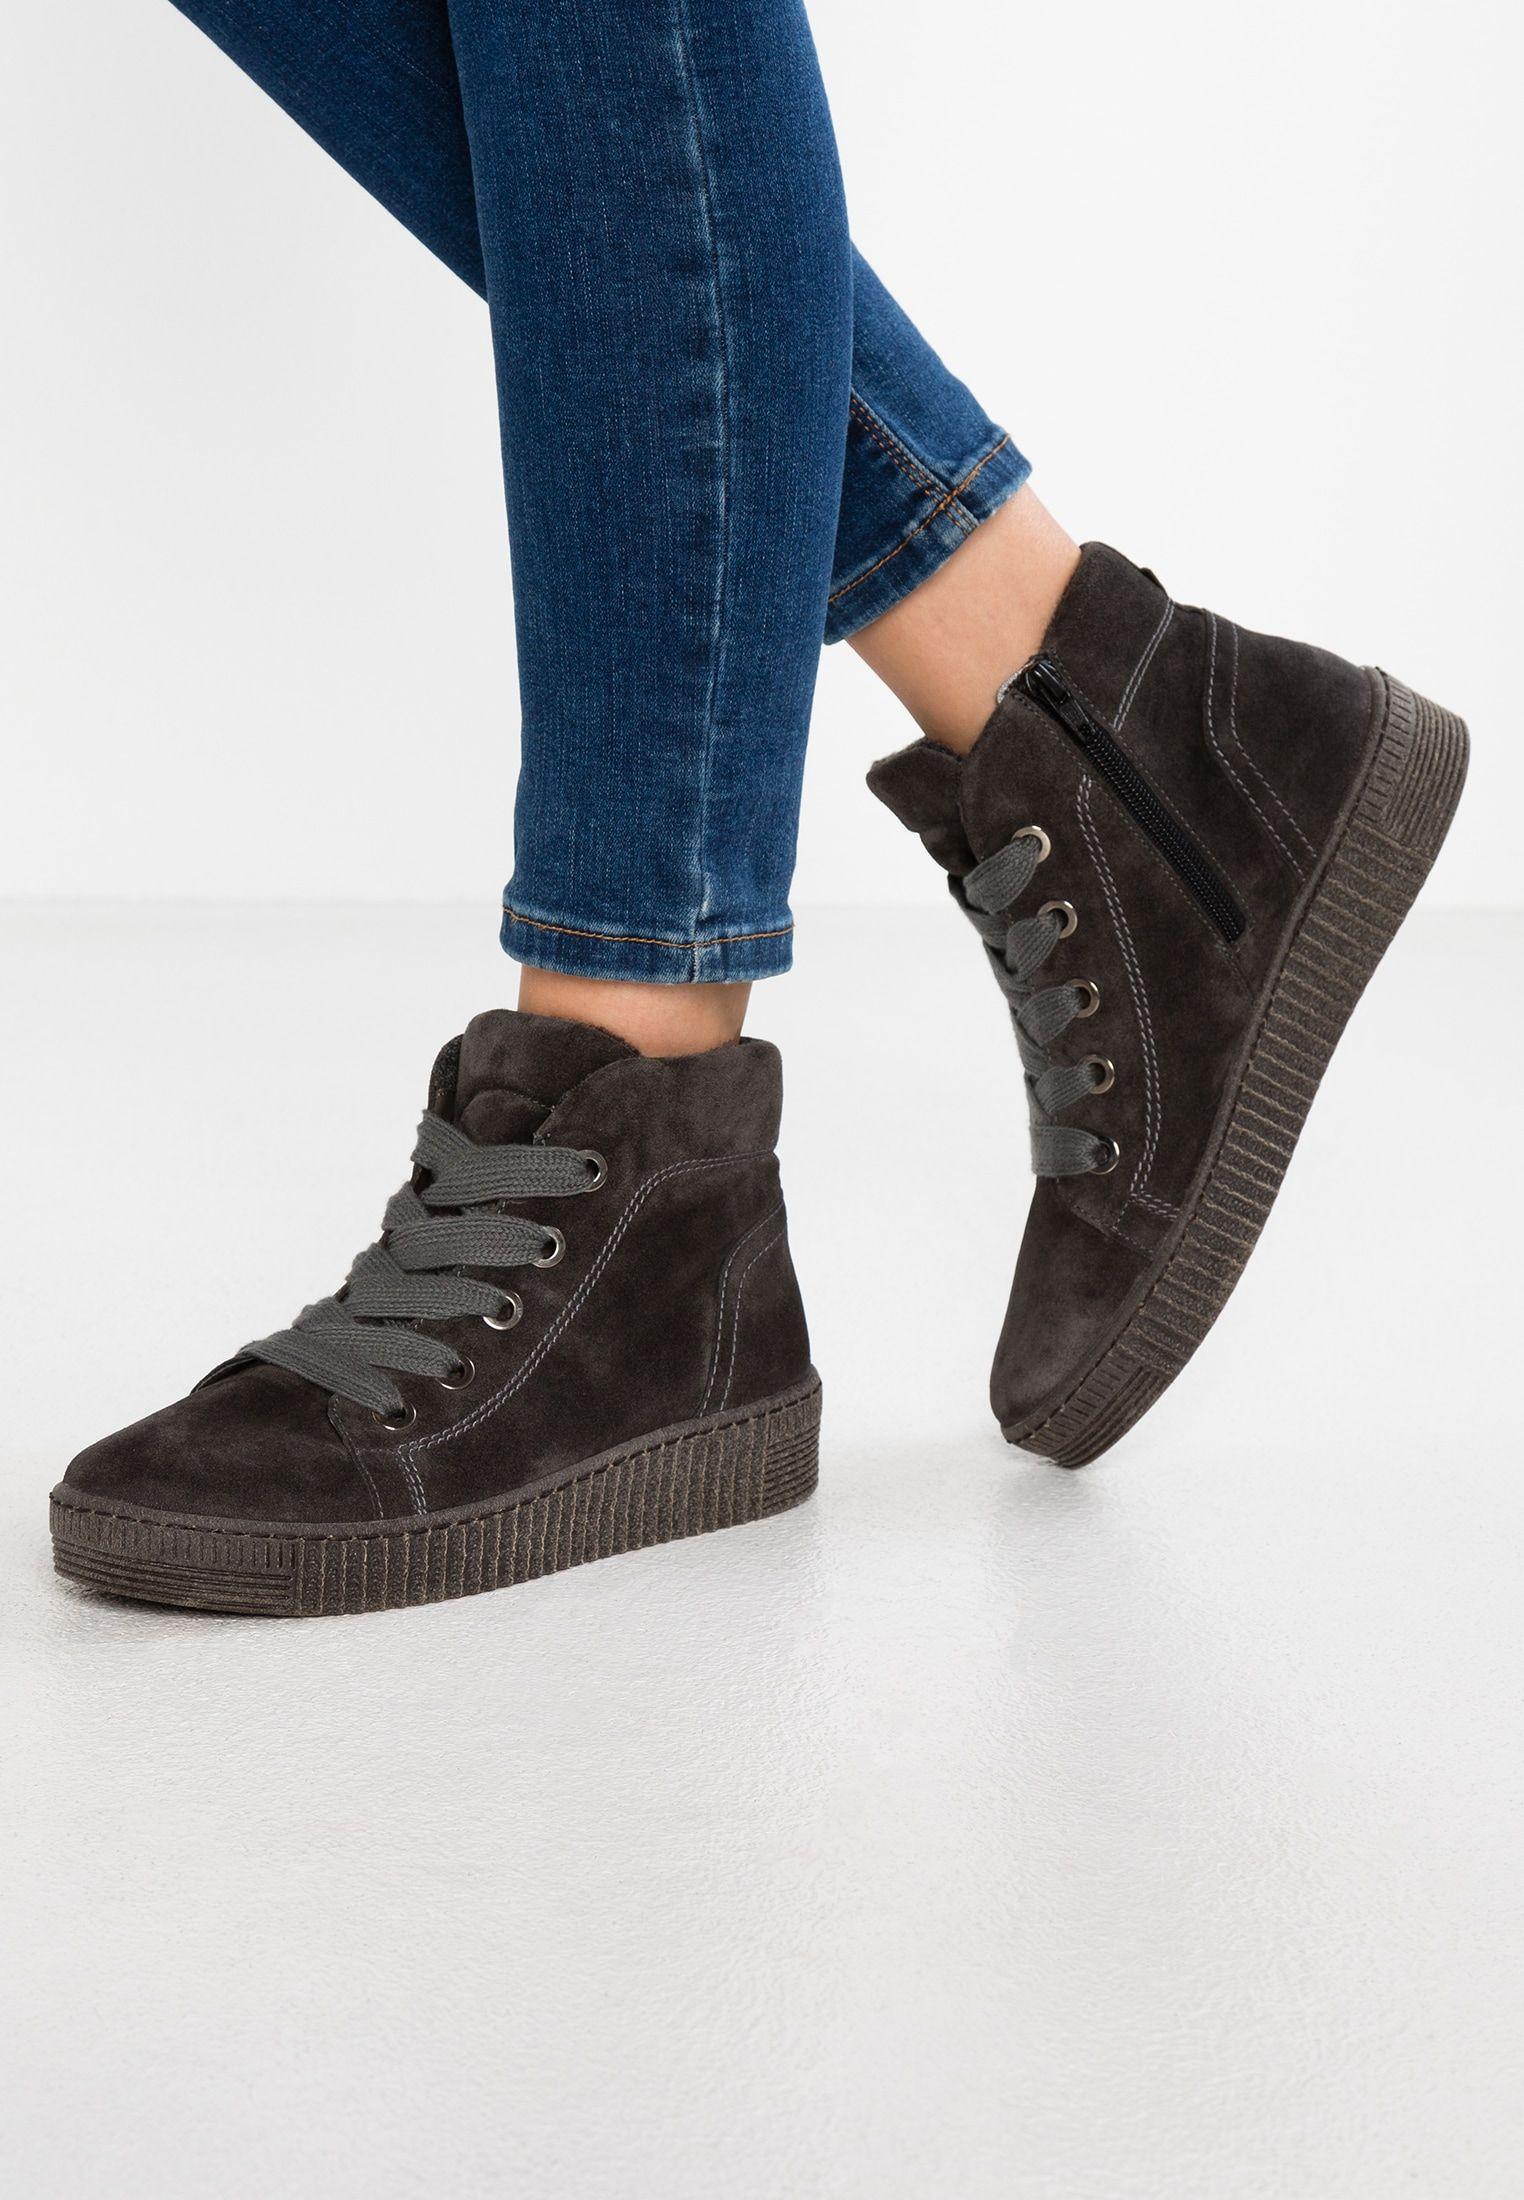 Gabor Sneakers Alte Pepper Zalando It Sneakers Alte Sneakers